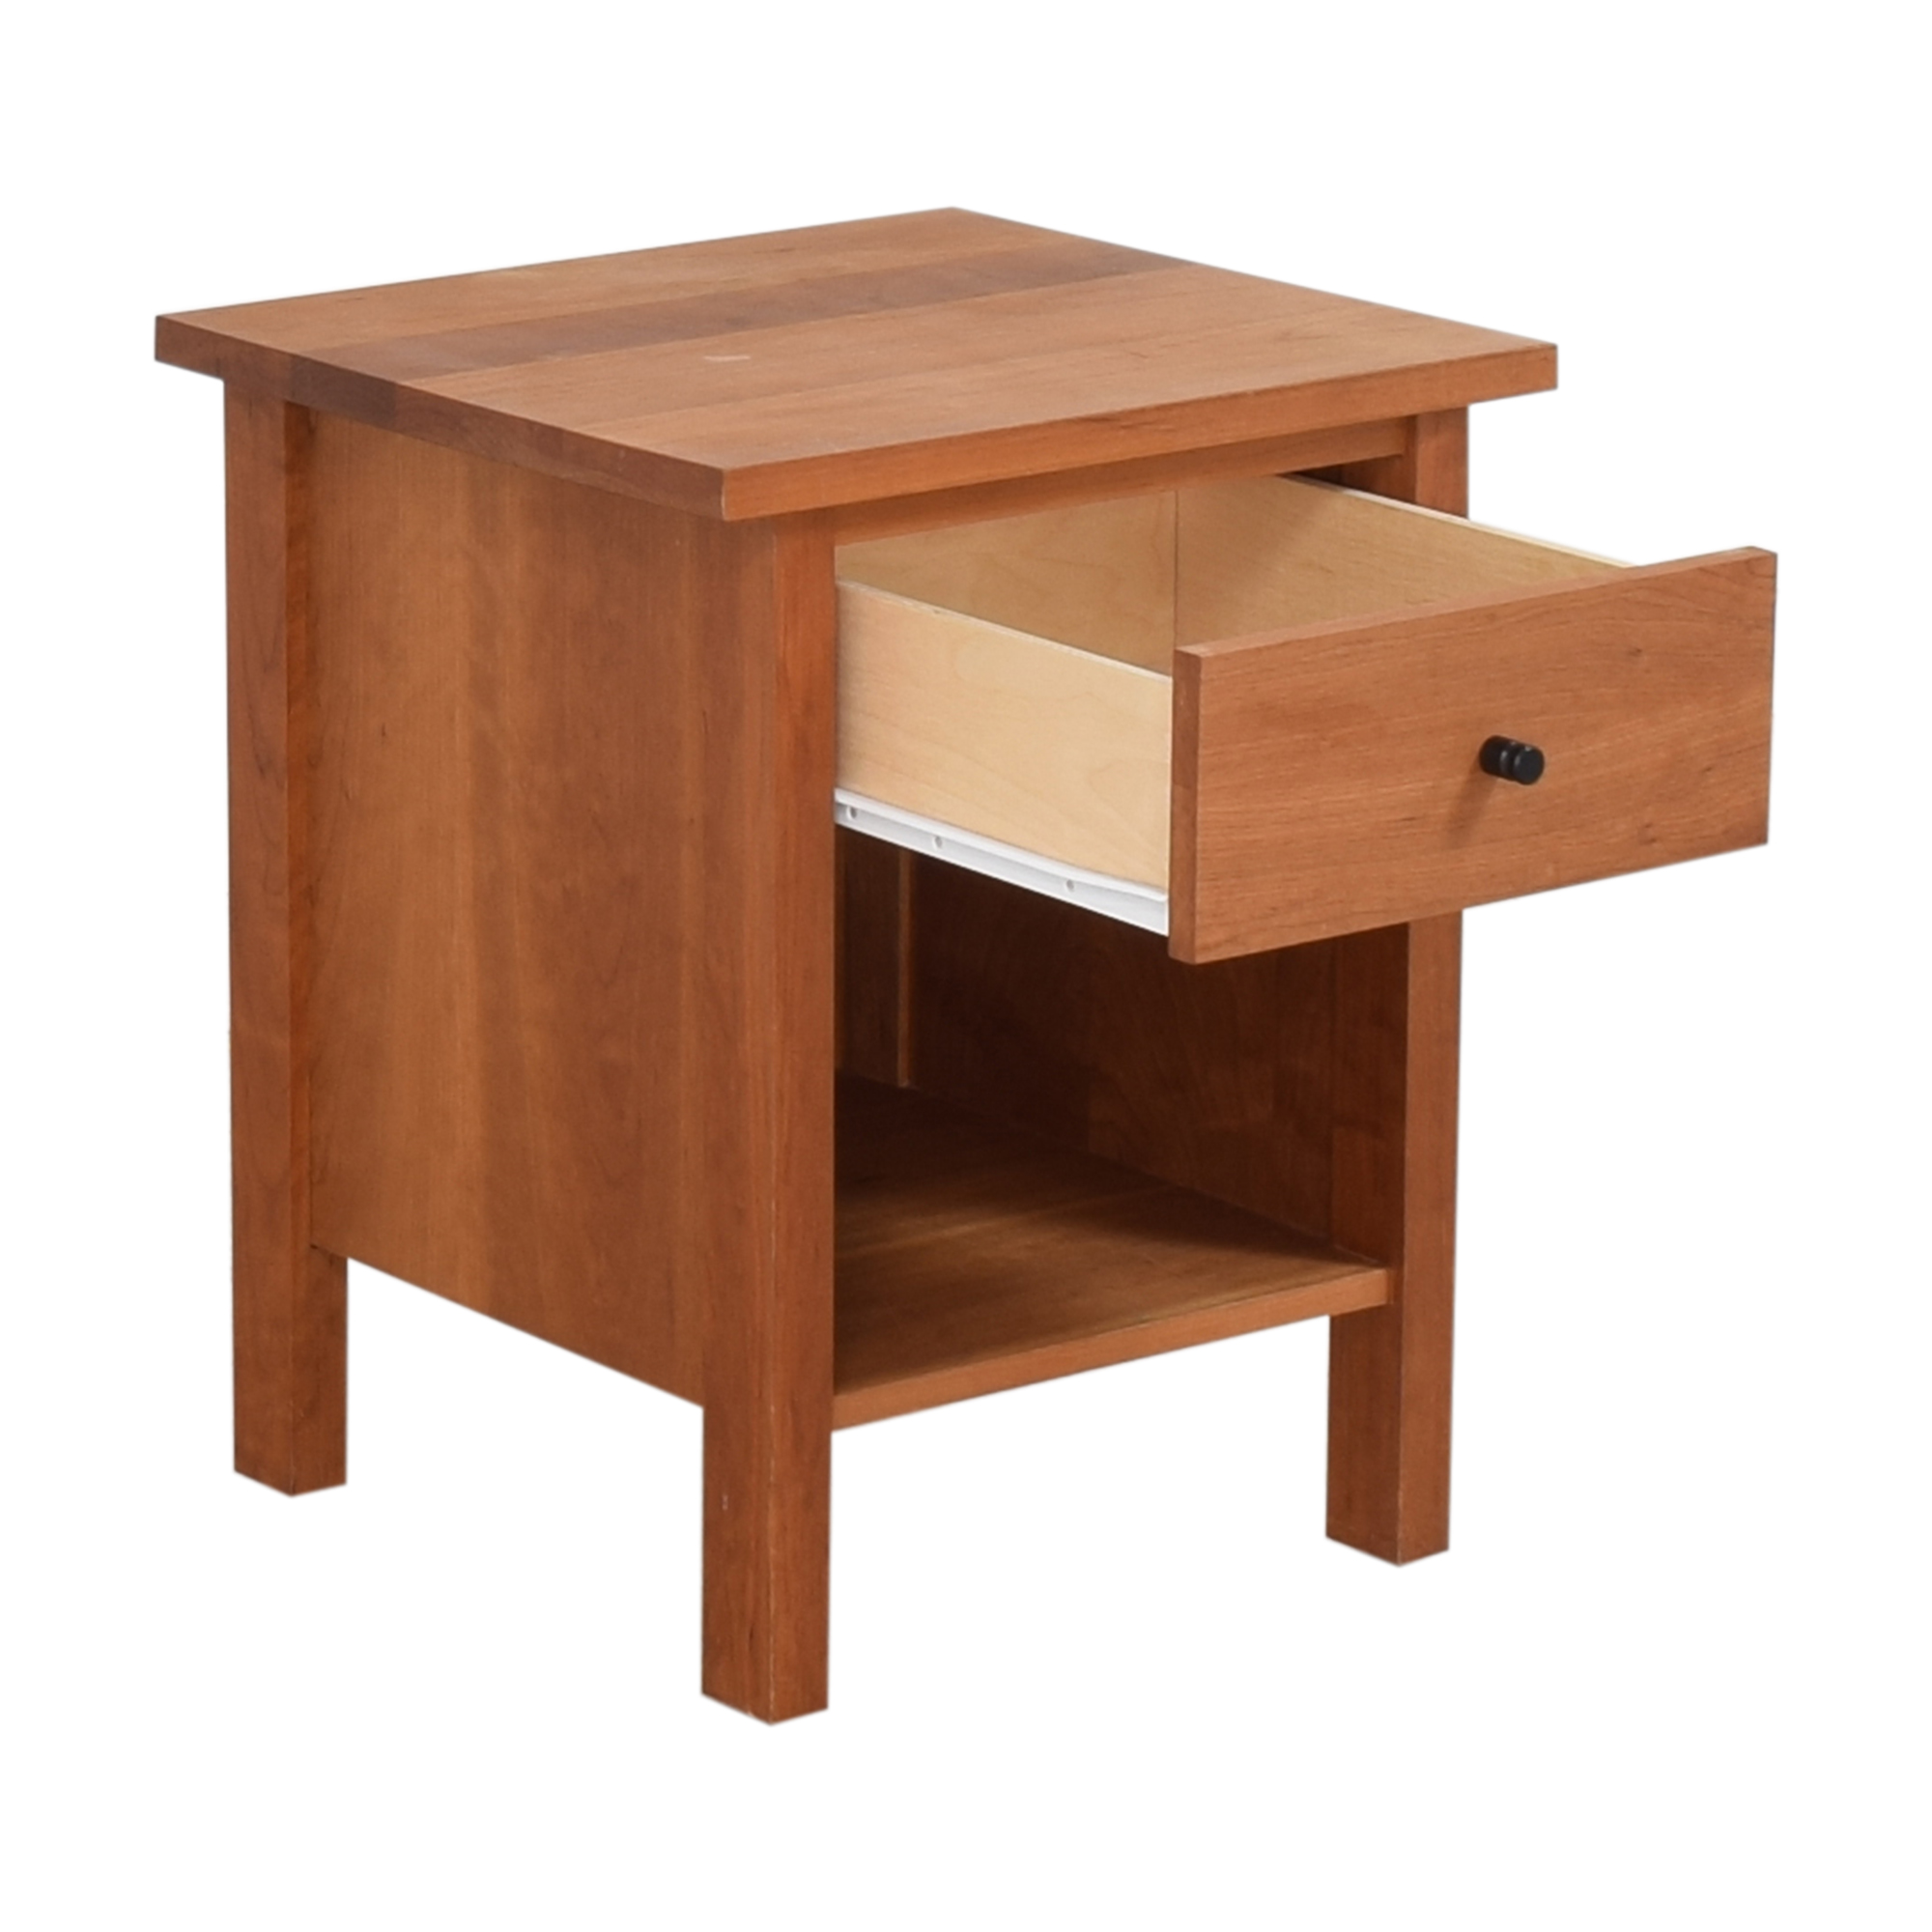 buy Room & Board Sherwood Single Drawer Nightstand Room & Board